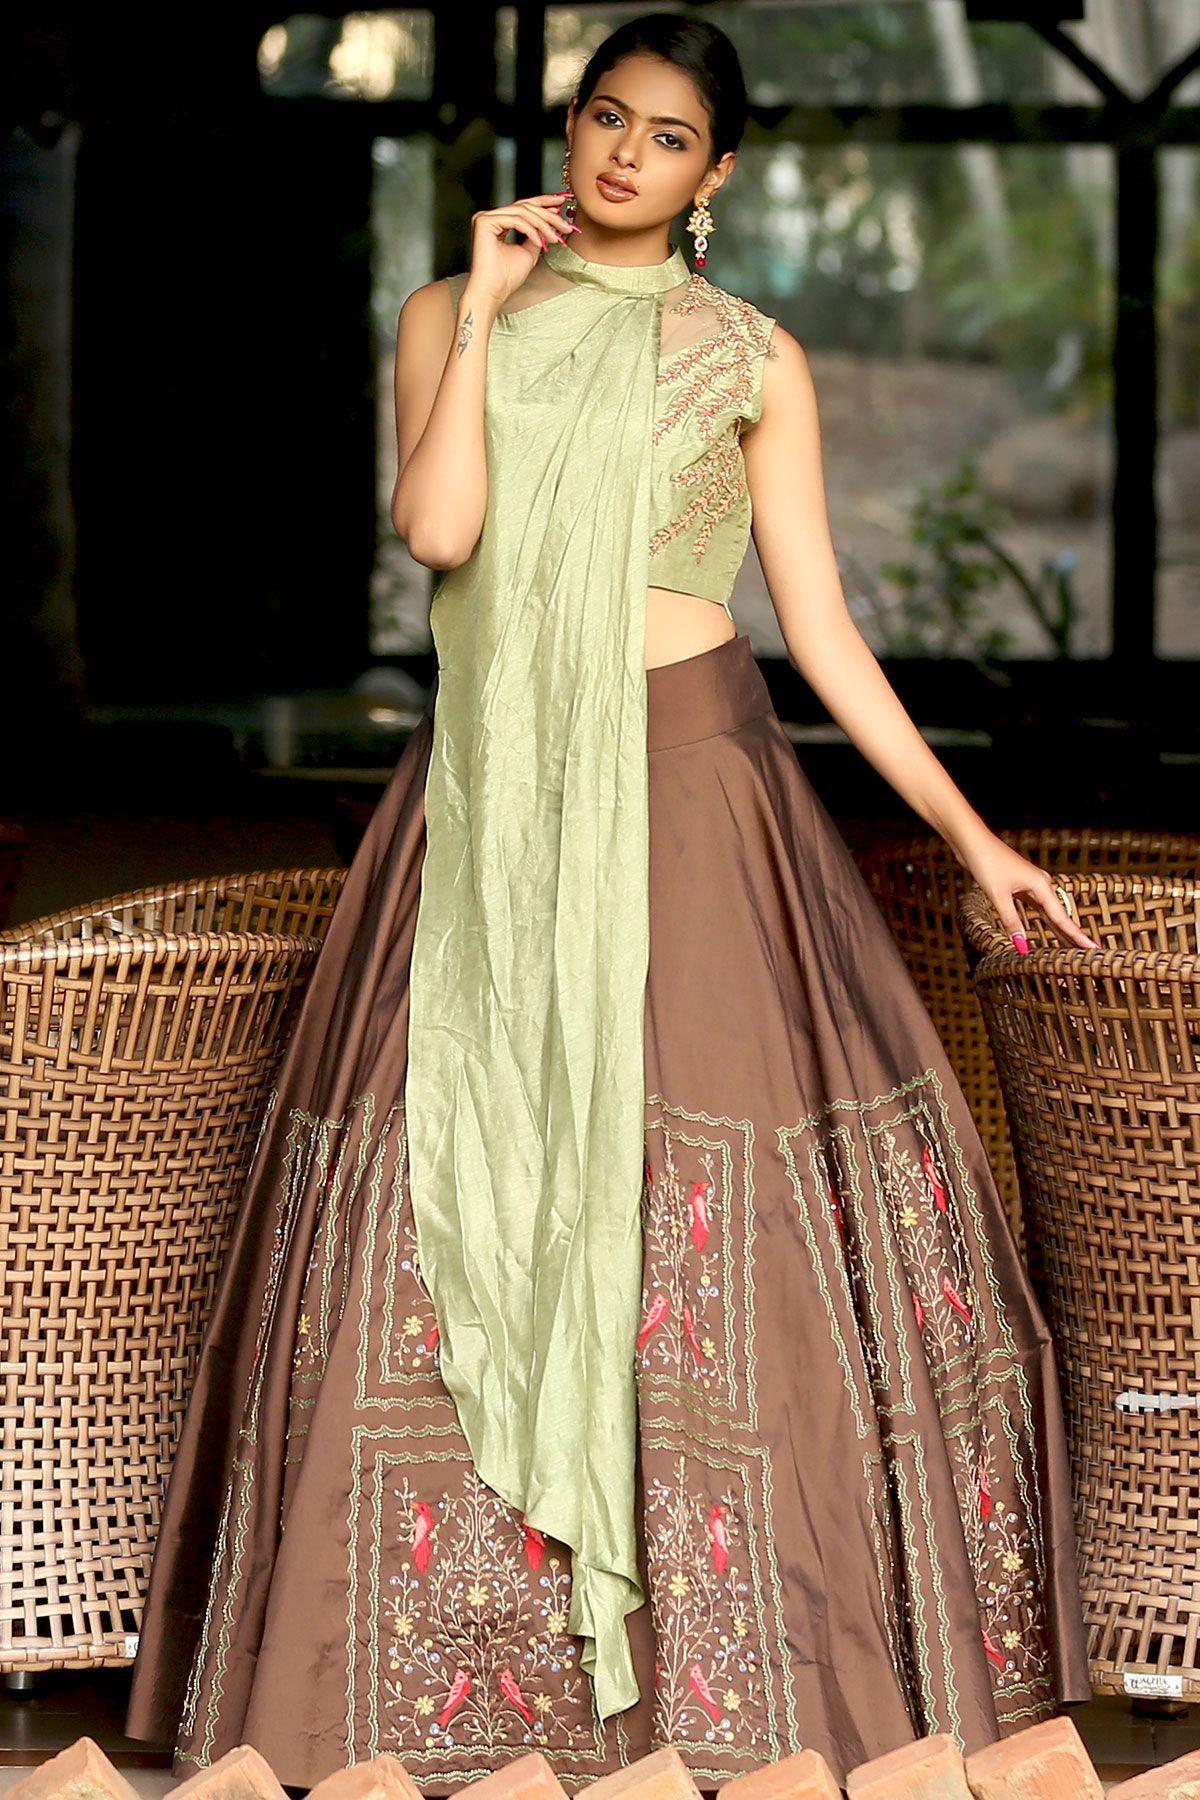 e49b393863 Buy Green & Brown Zardosi Embroidered Silk Bridesmaids Lehenga Online